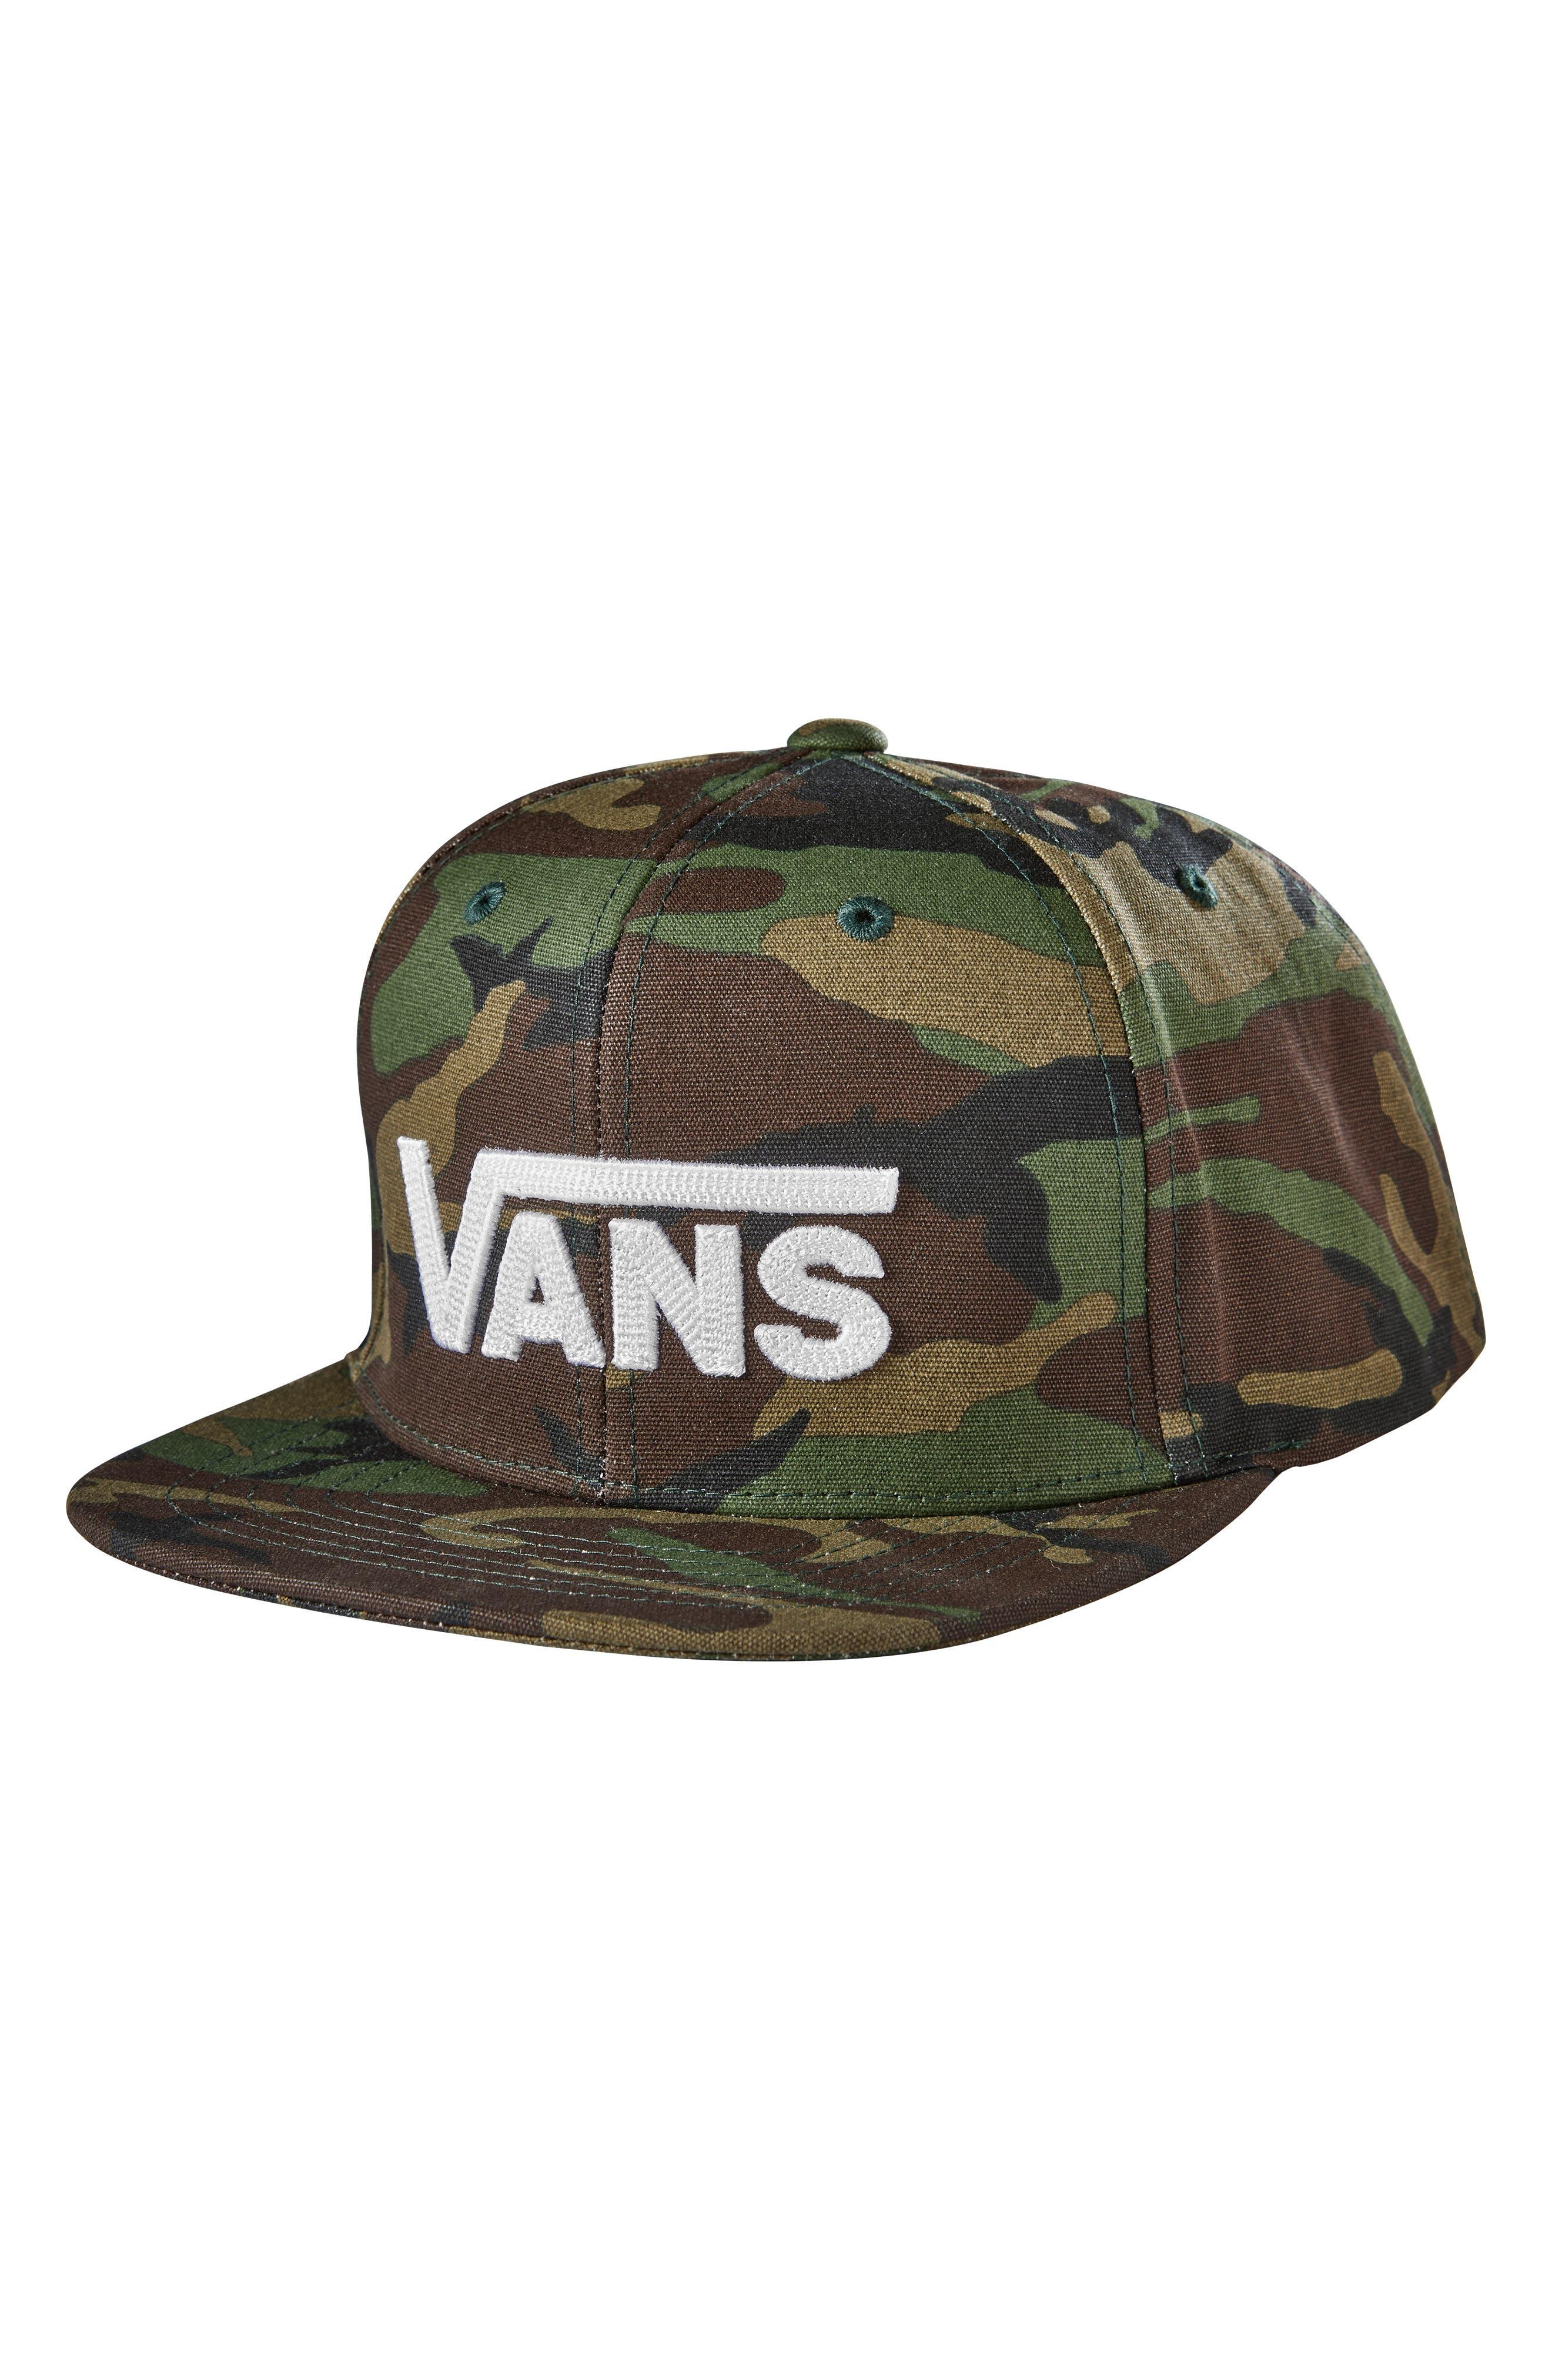 VANS, Drop VII Snapback Baseball Cap, Main thumbnail 1, color, 300